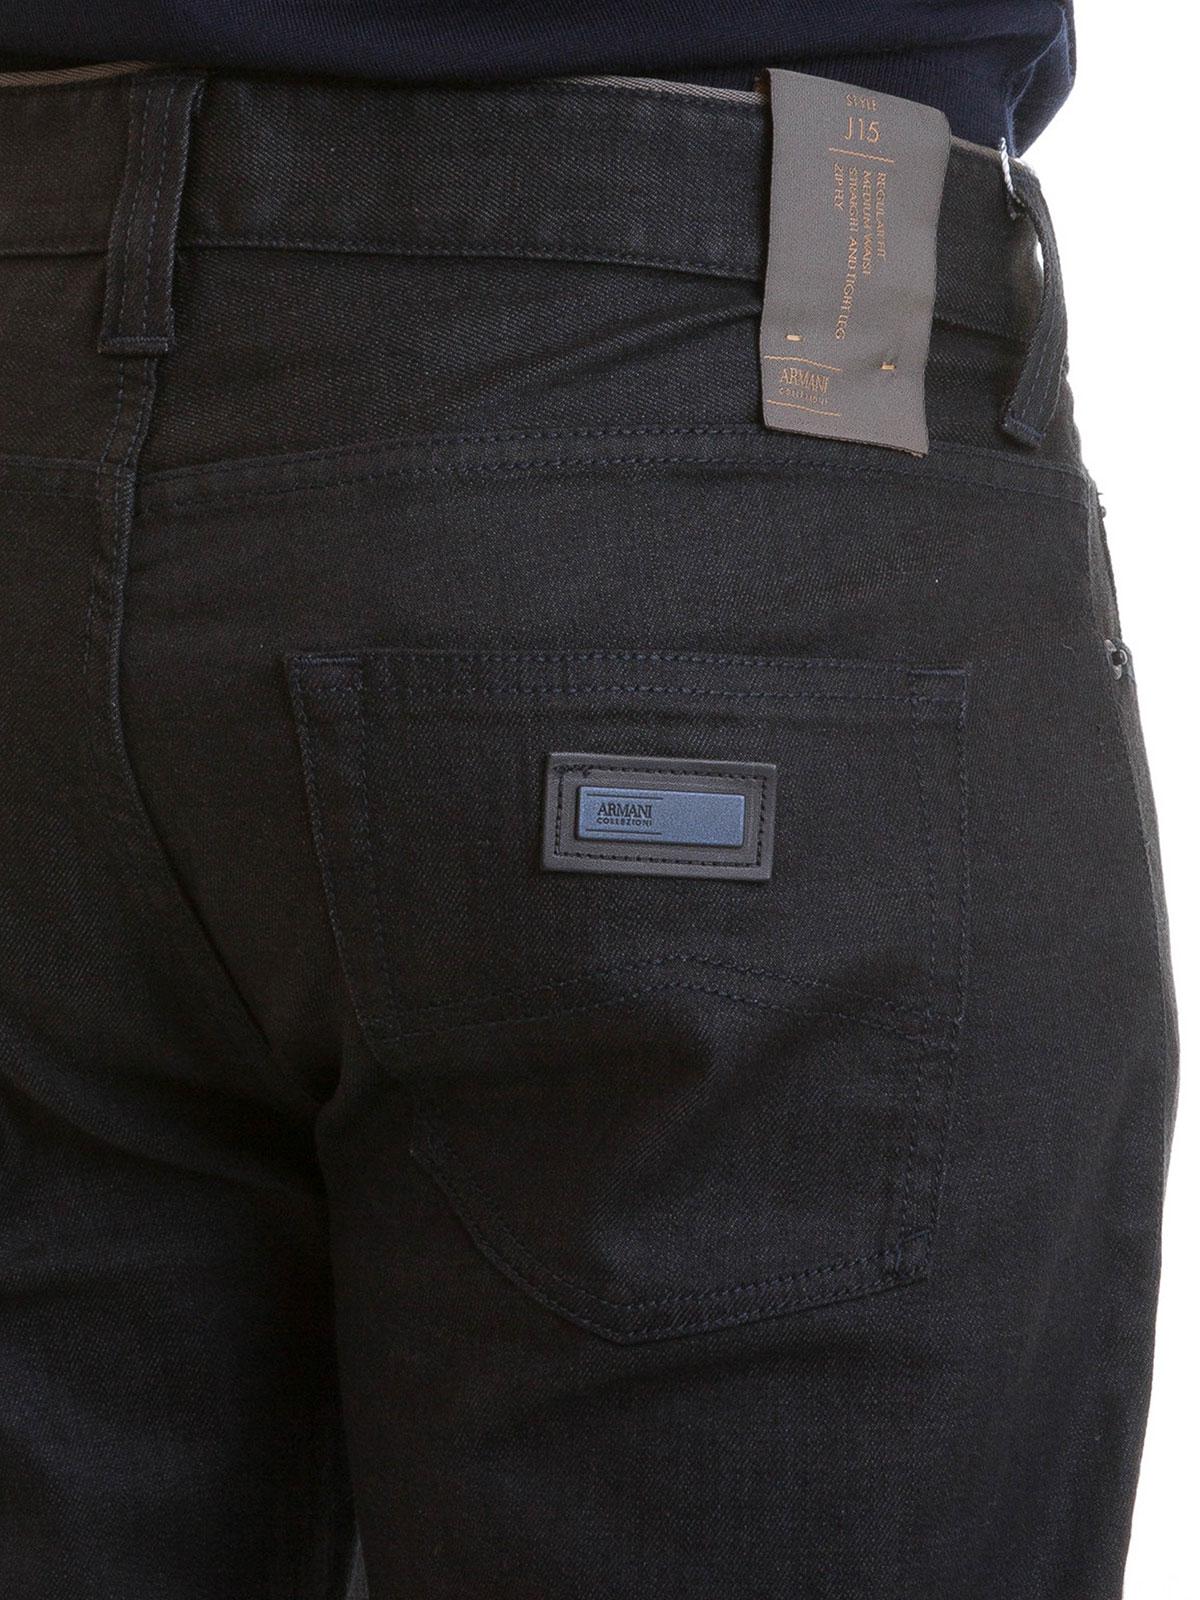 meet 7de77 91a29 Armani Collezioni - 5 pockets bootcut denim jeans - bootcut ...